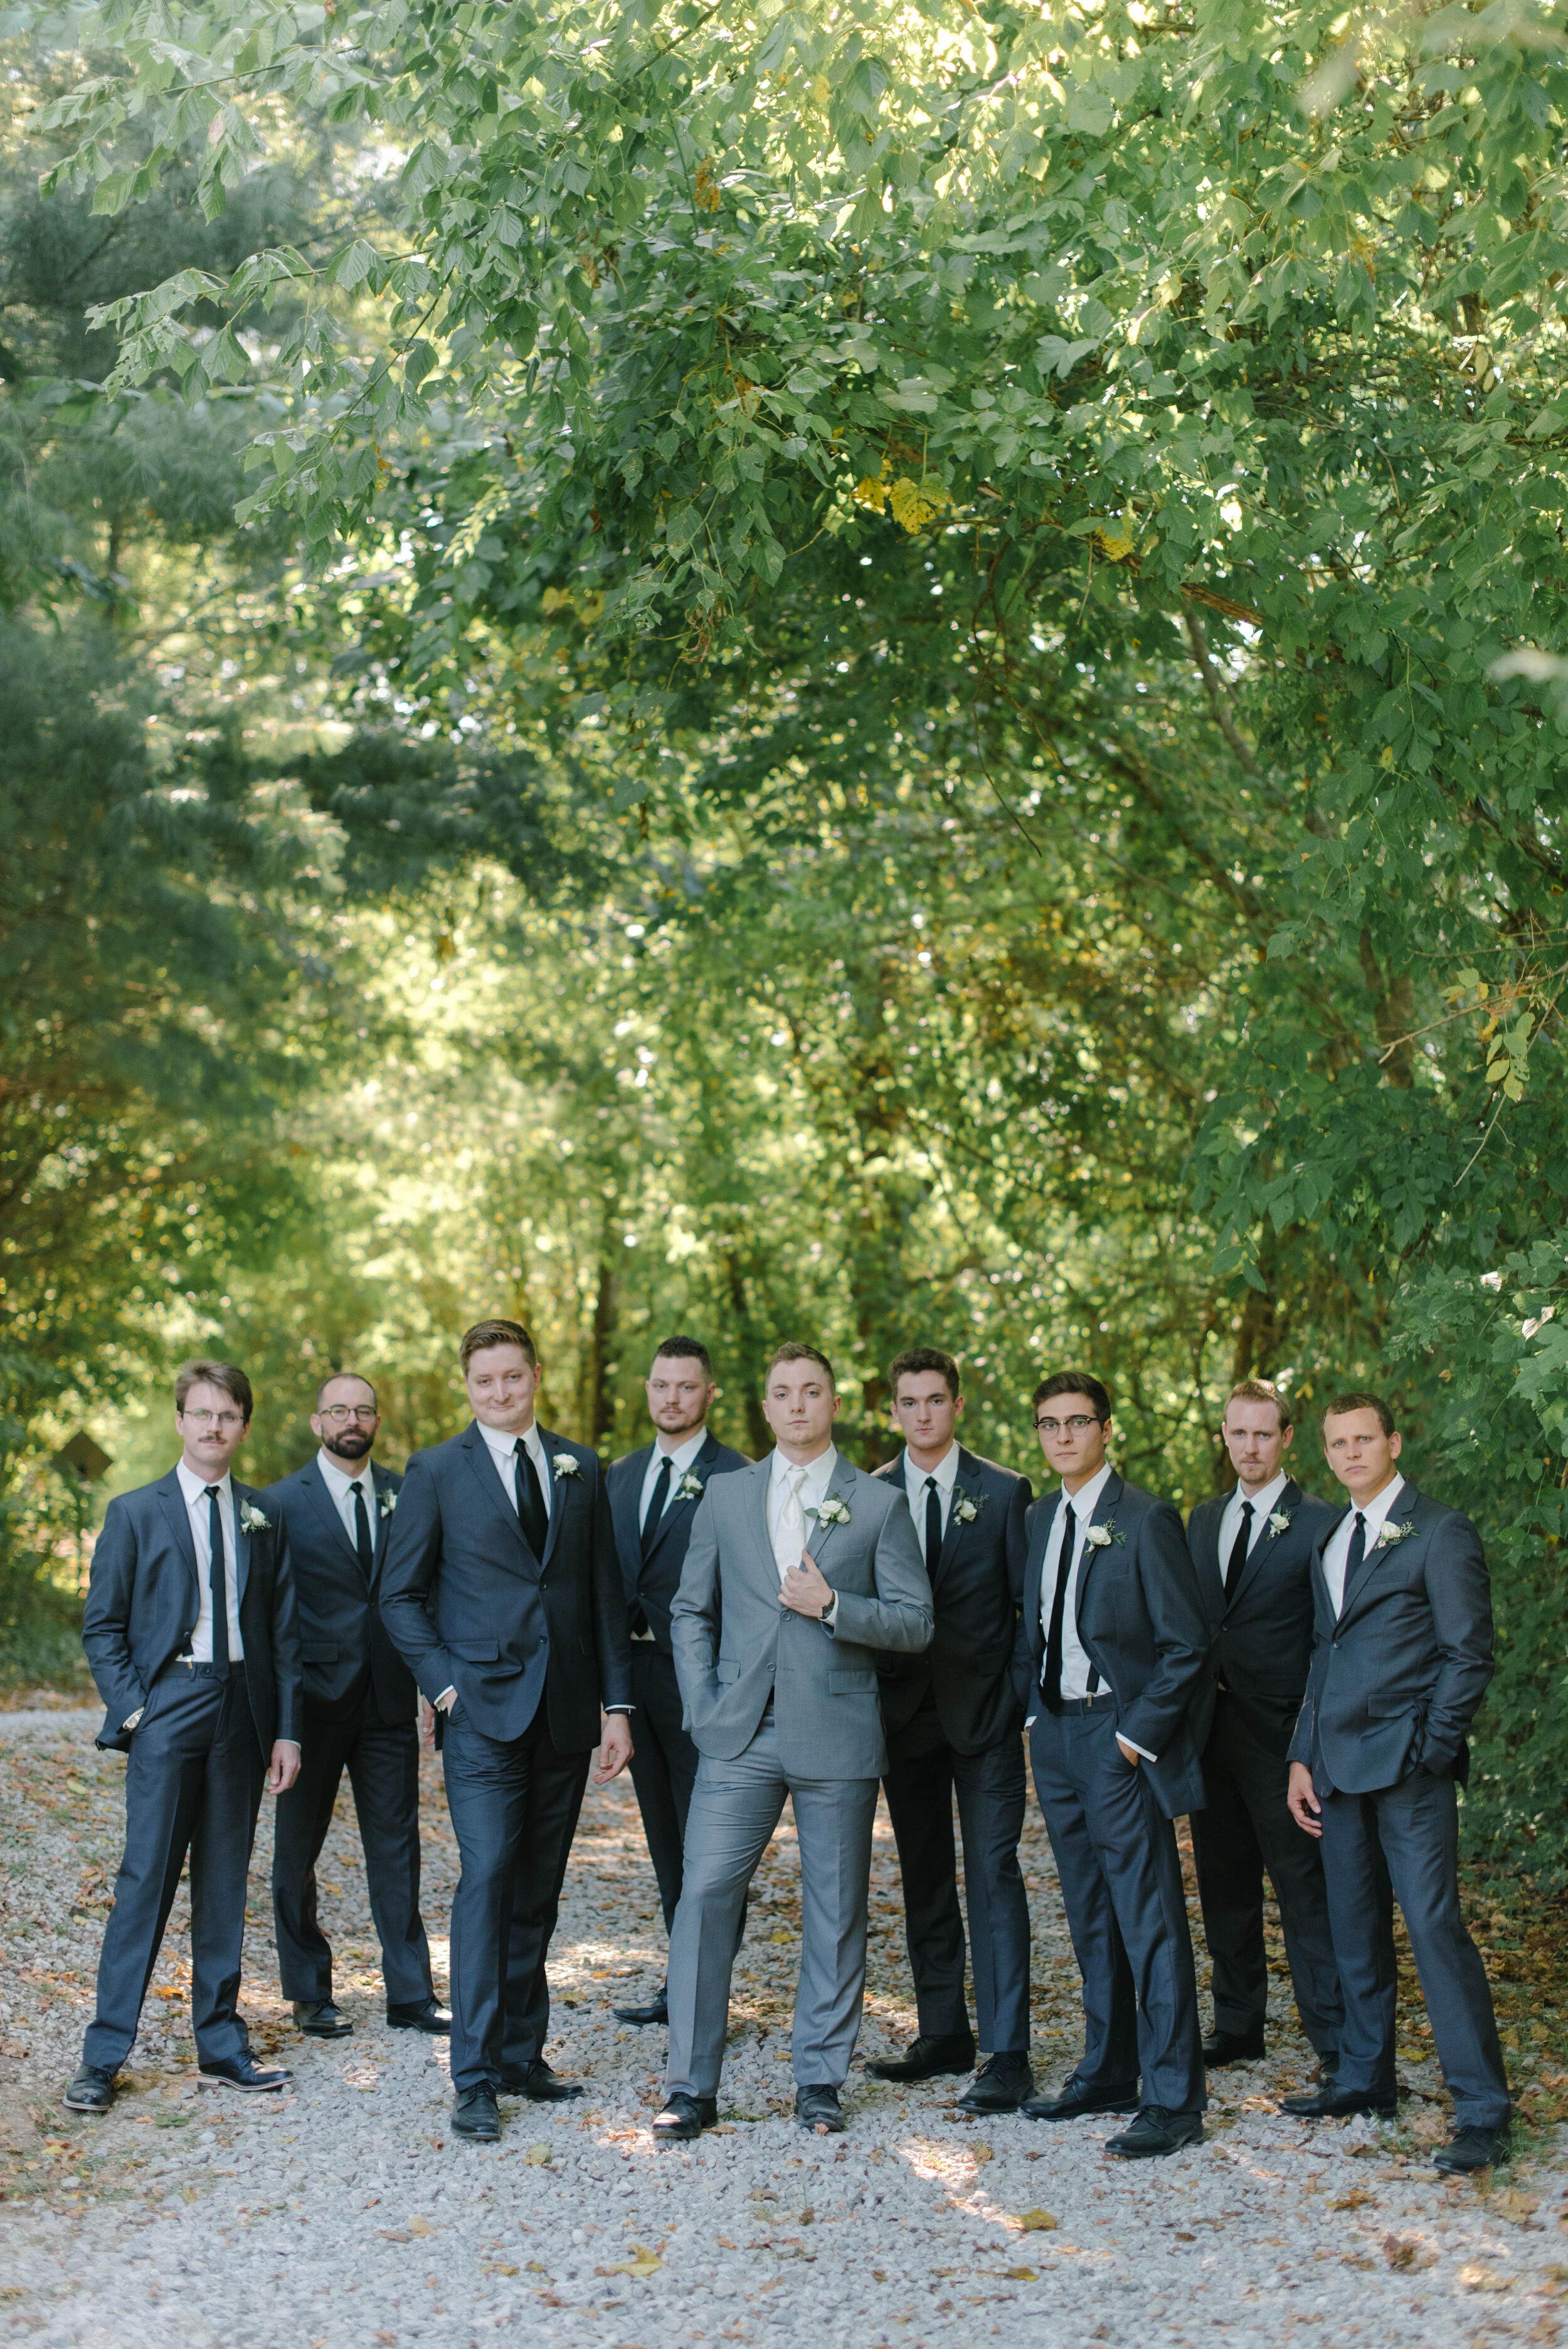 Amy & Aaron Diehl Wedding_September 7 2019_Meadow Hill Farm_Columbia Tennesse_Jessica Sheppard_Nashville Photographer-505.jpg